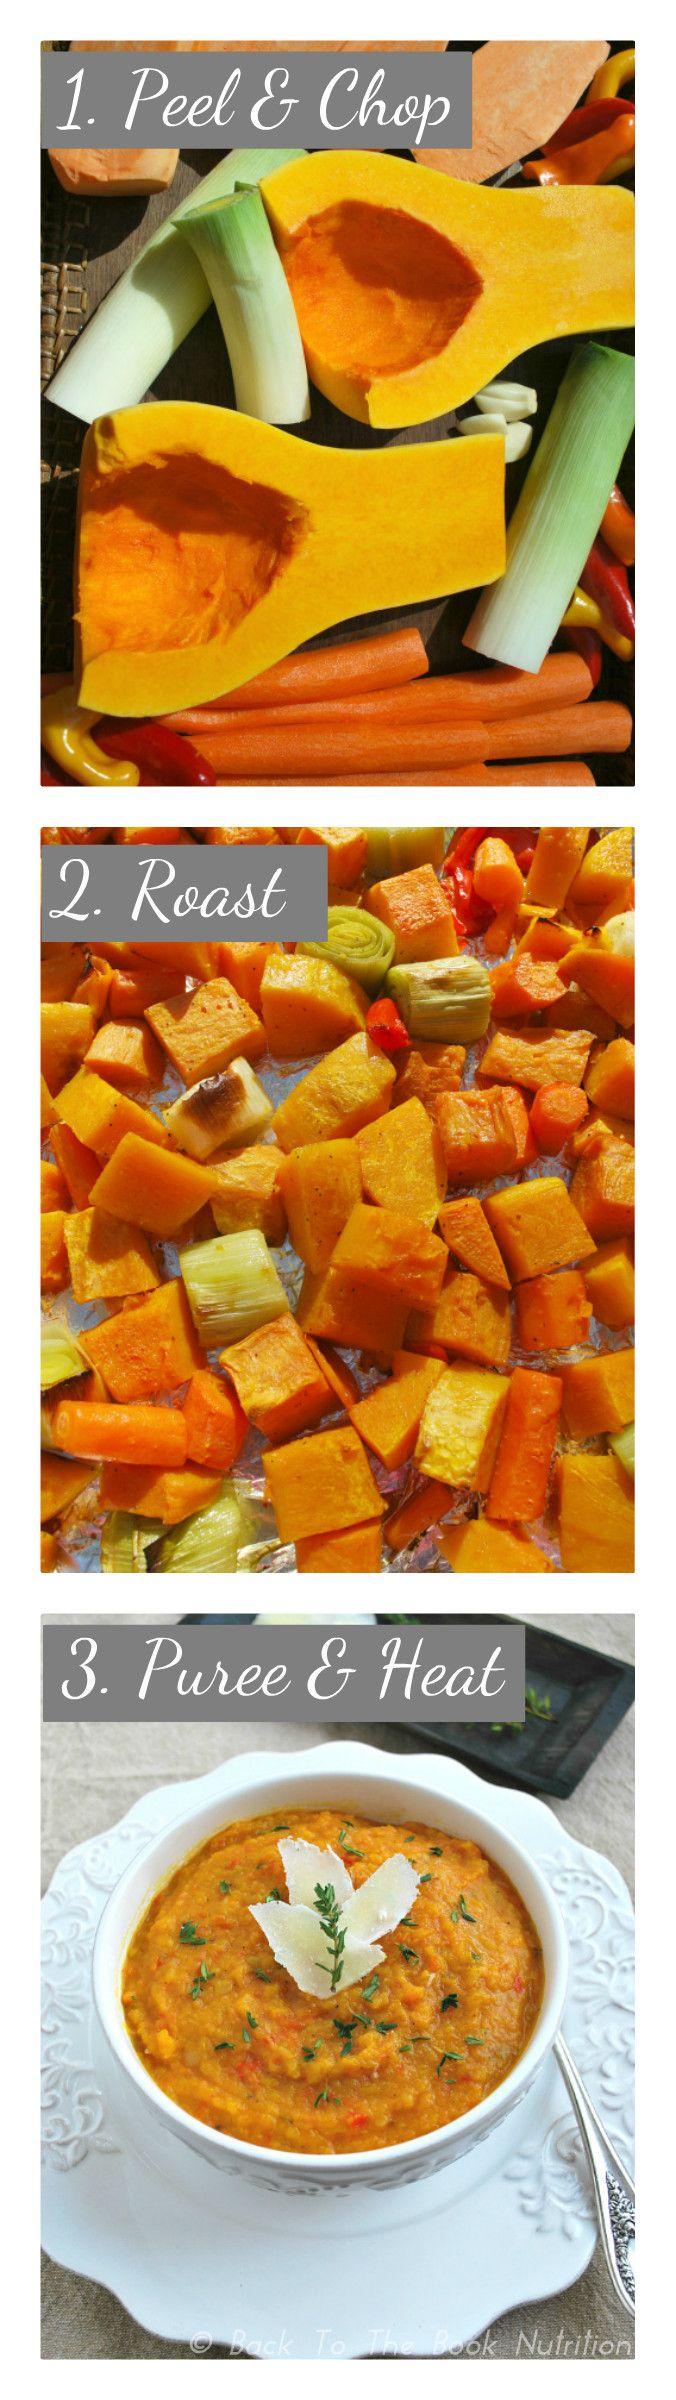 Roasted Winter Vegetable Soup in 3 easy steps {gluten, grain & dairy free} - www.backtothebooknutrition.com/blog